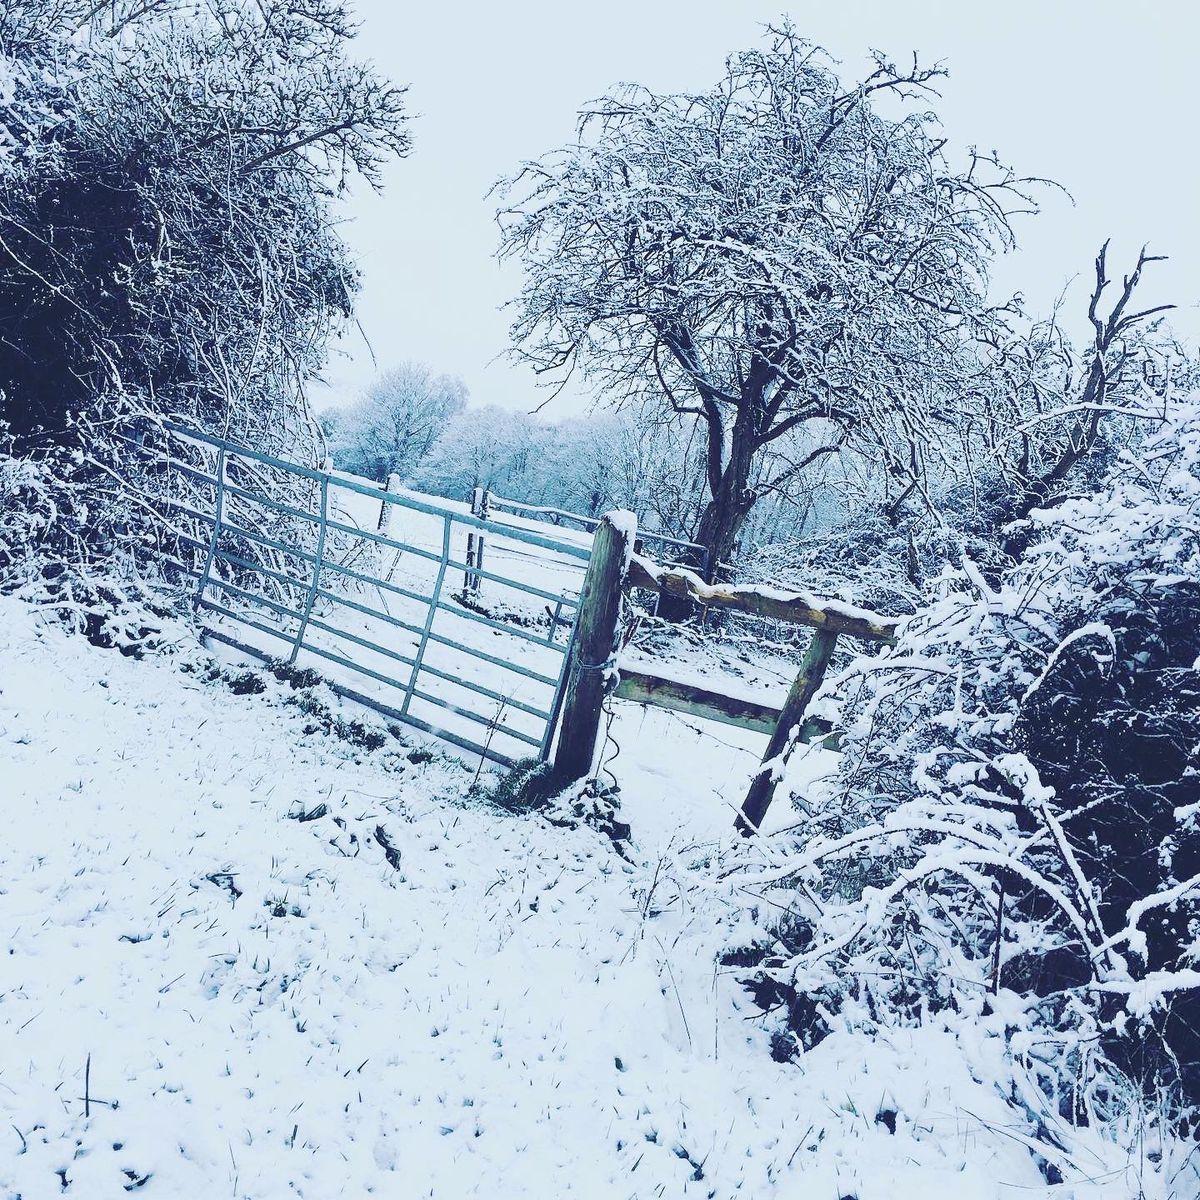 Snow in Shareshill and Little Saredon taken by Karen Hilditch